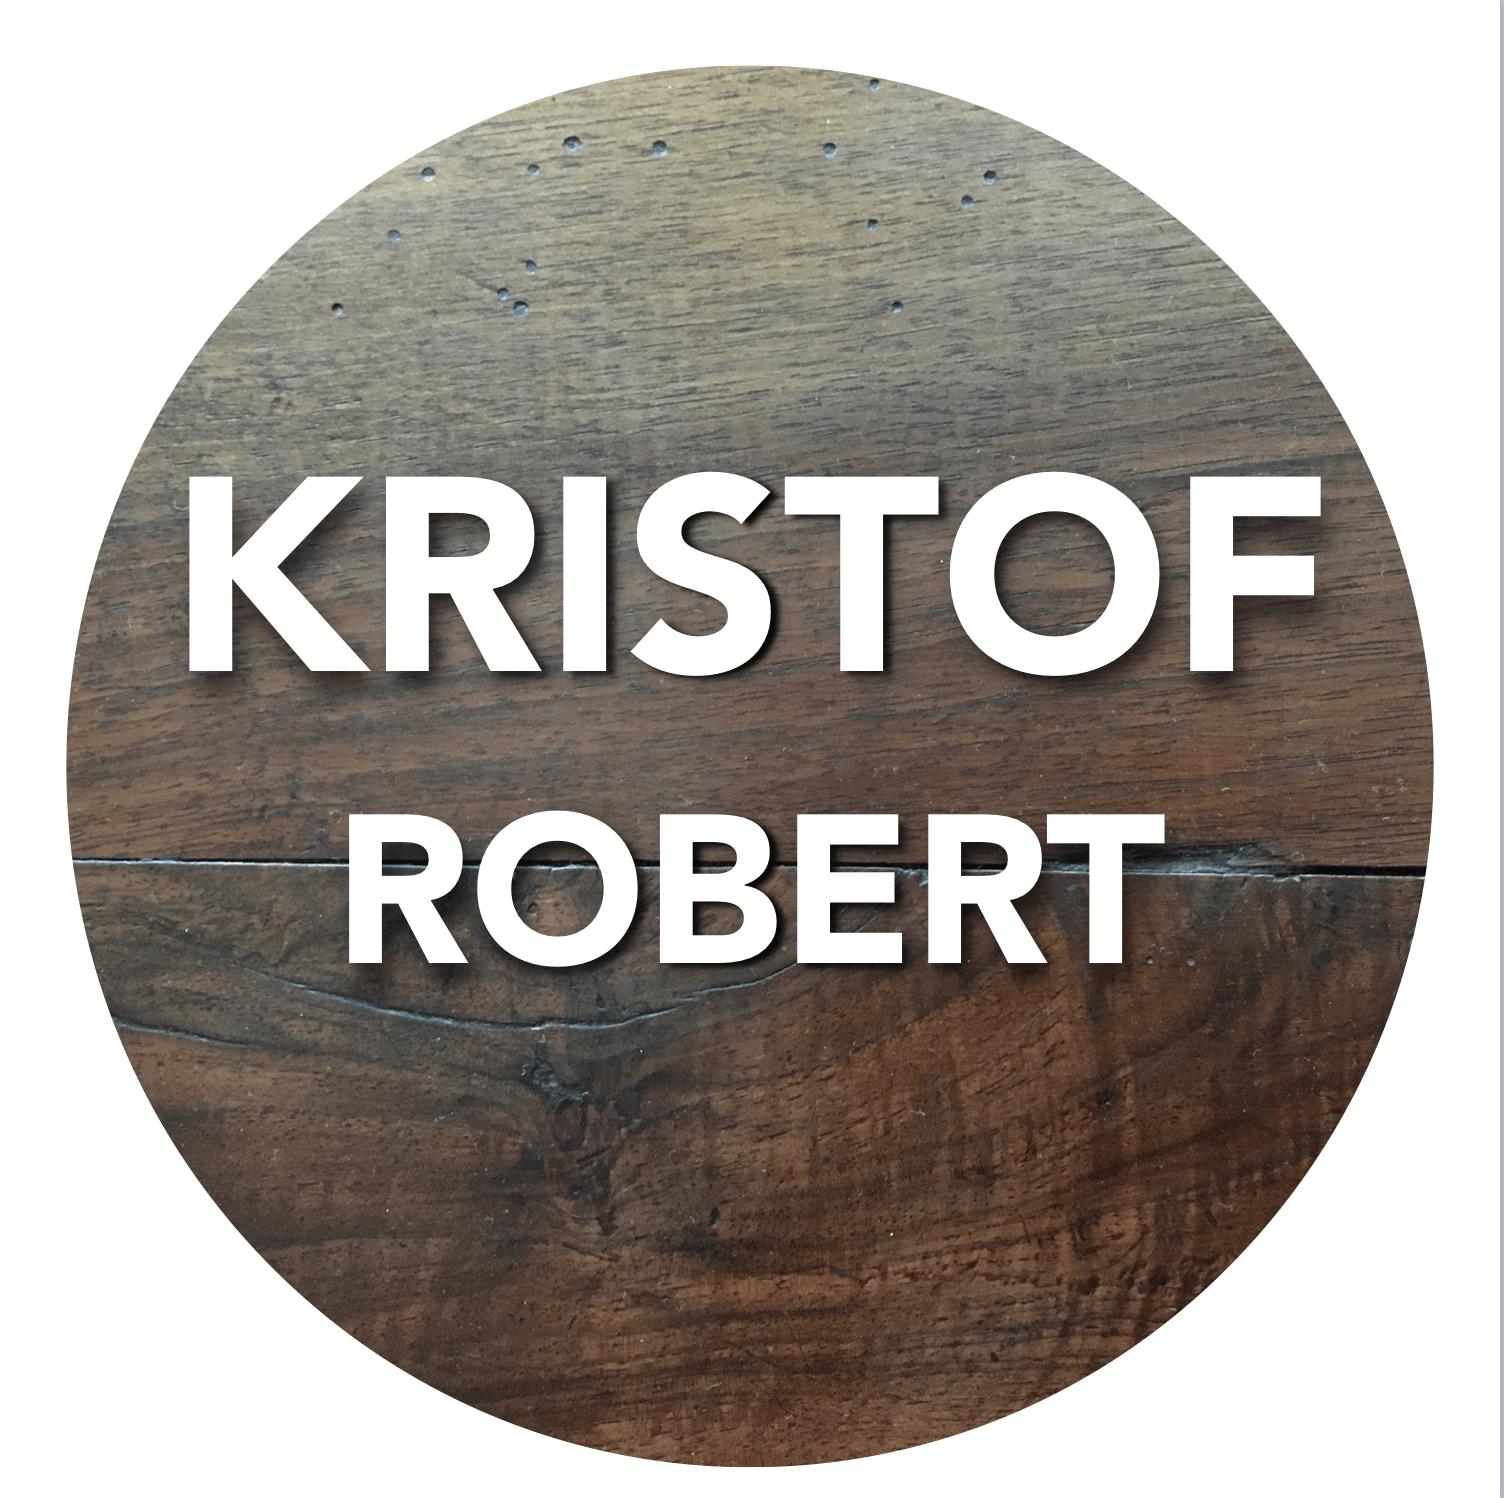 Kristof Robert